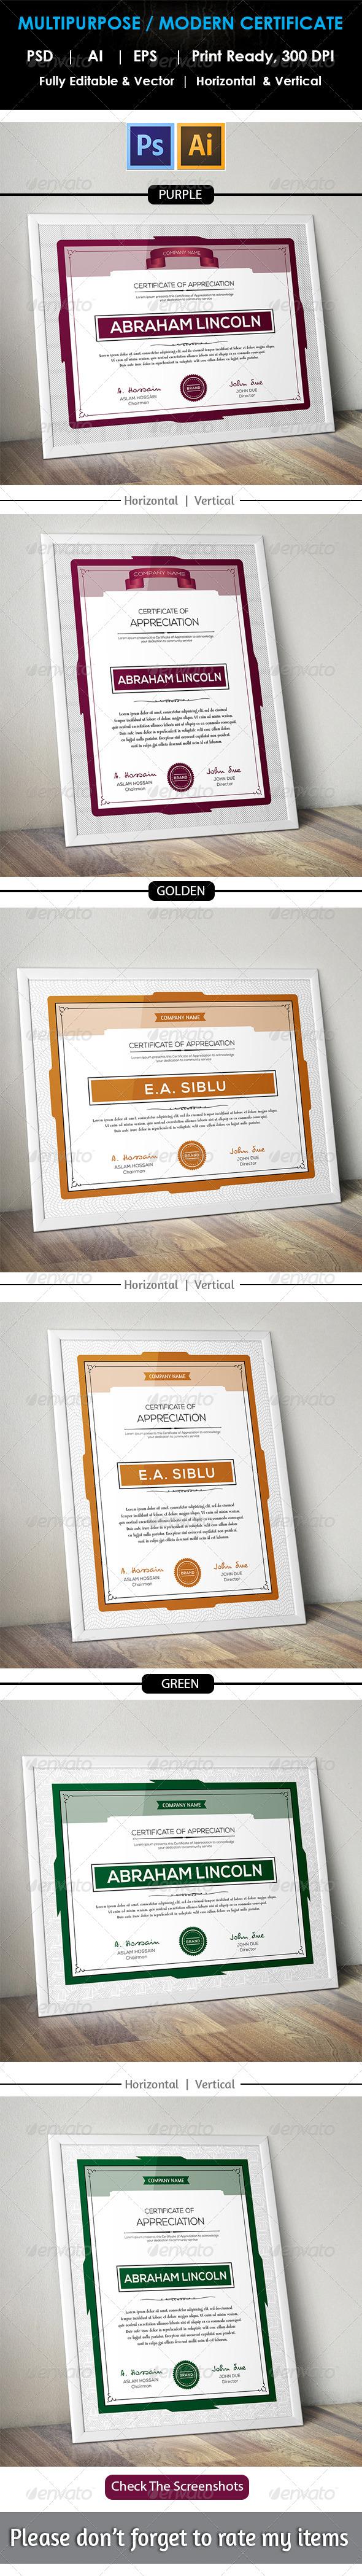 GraphicRiver Clean Multipurpose Certificate GD13 8757420